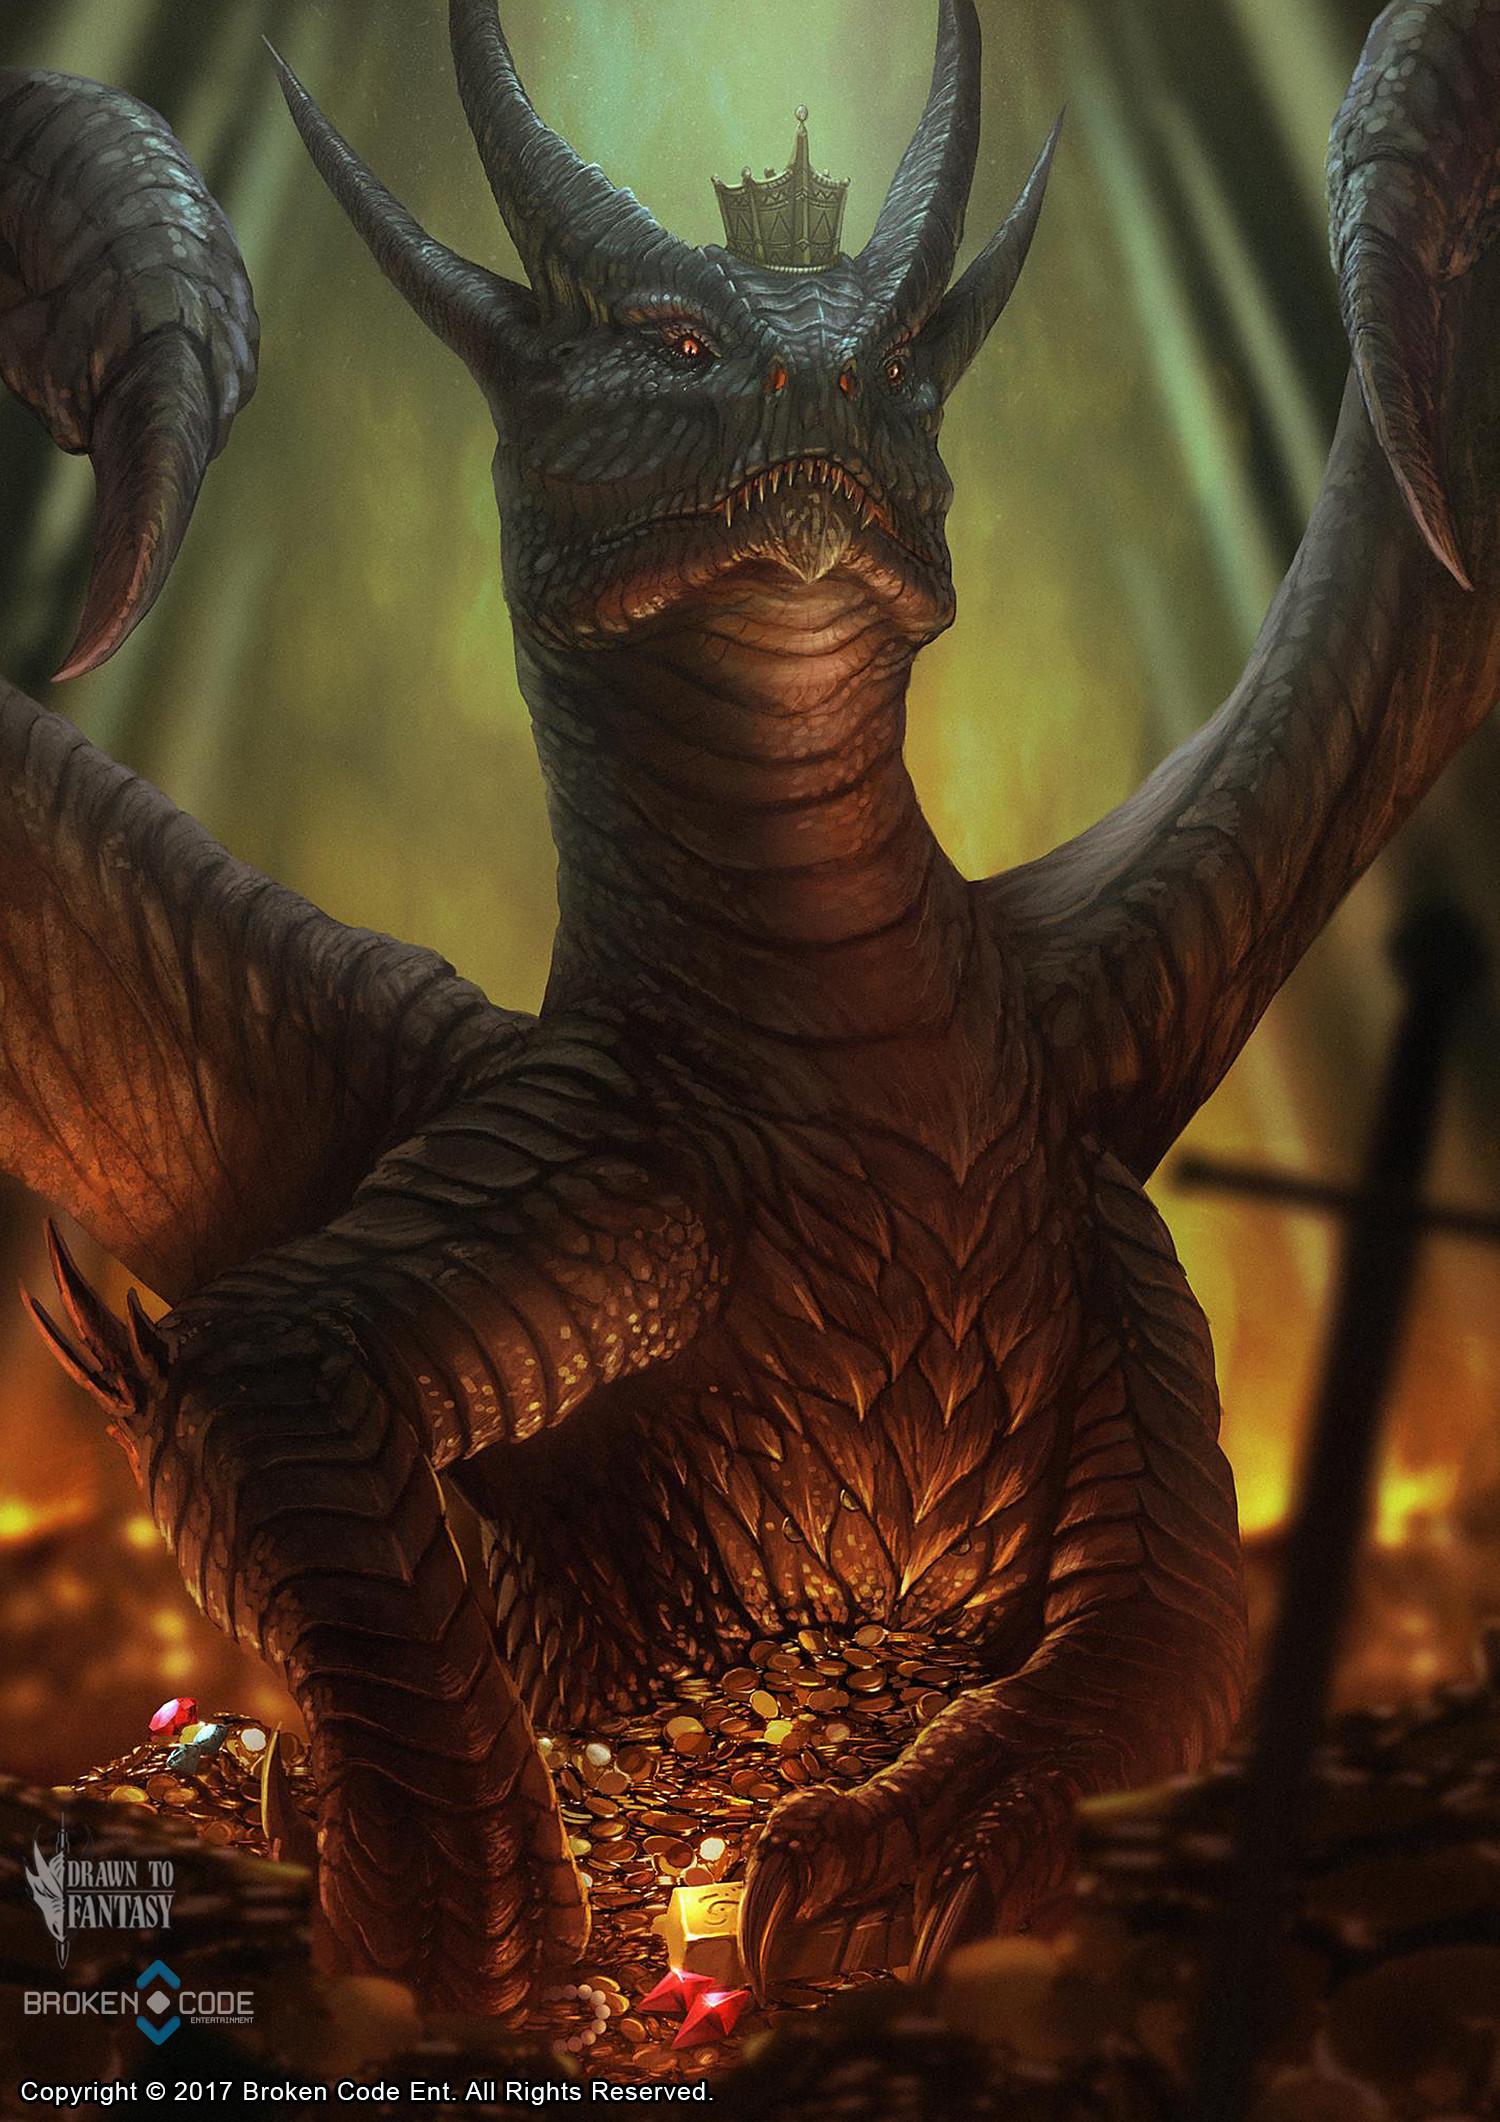 Robert crescenzio dragonofgreed dtf dc robertcrescenzio